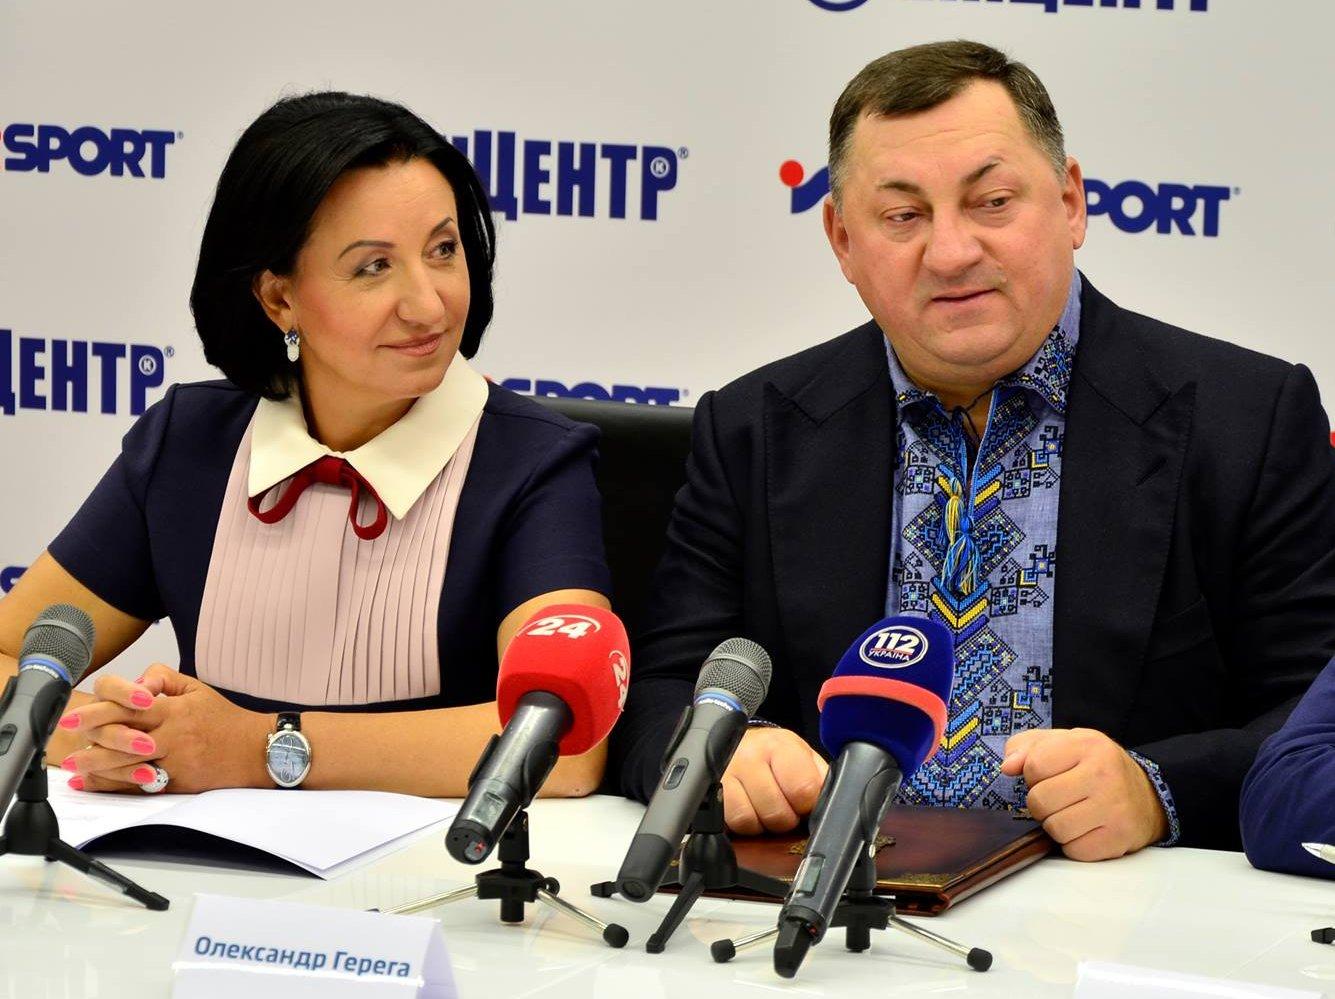 Галина и Александр Гереги